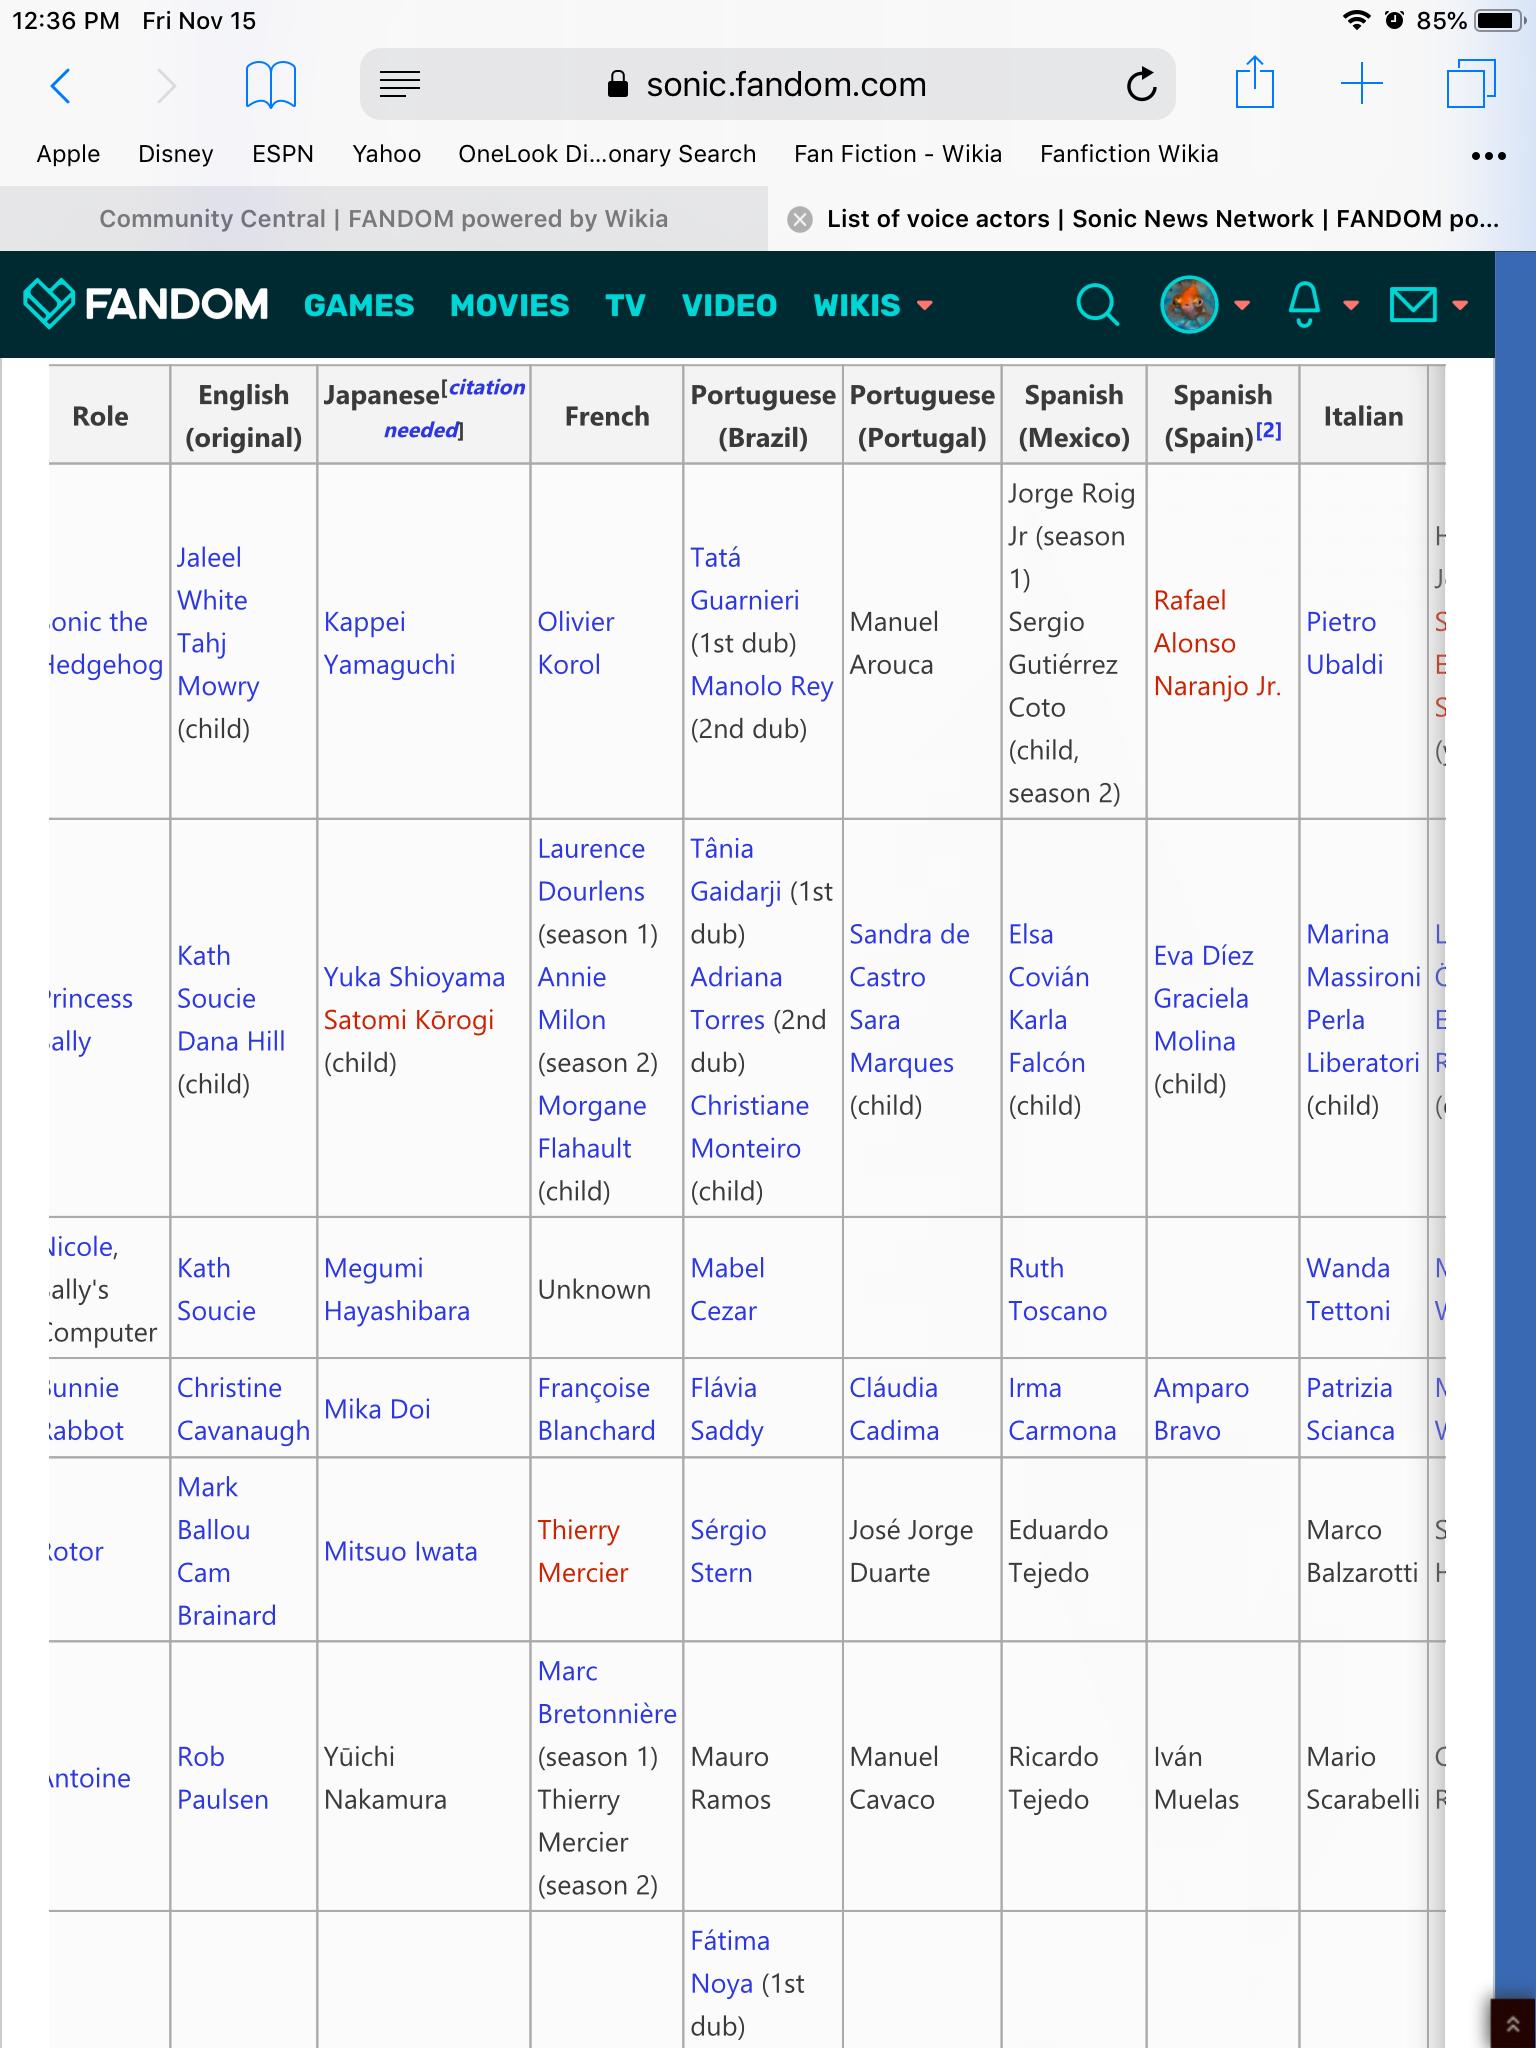 Sonic the Hedgehog Voice Actors Page 1